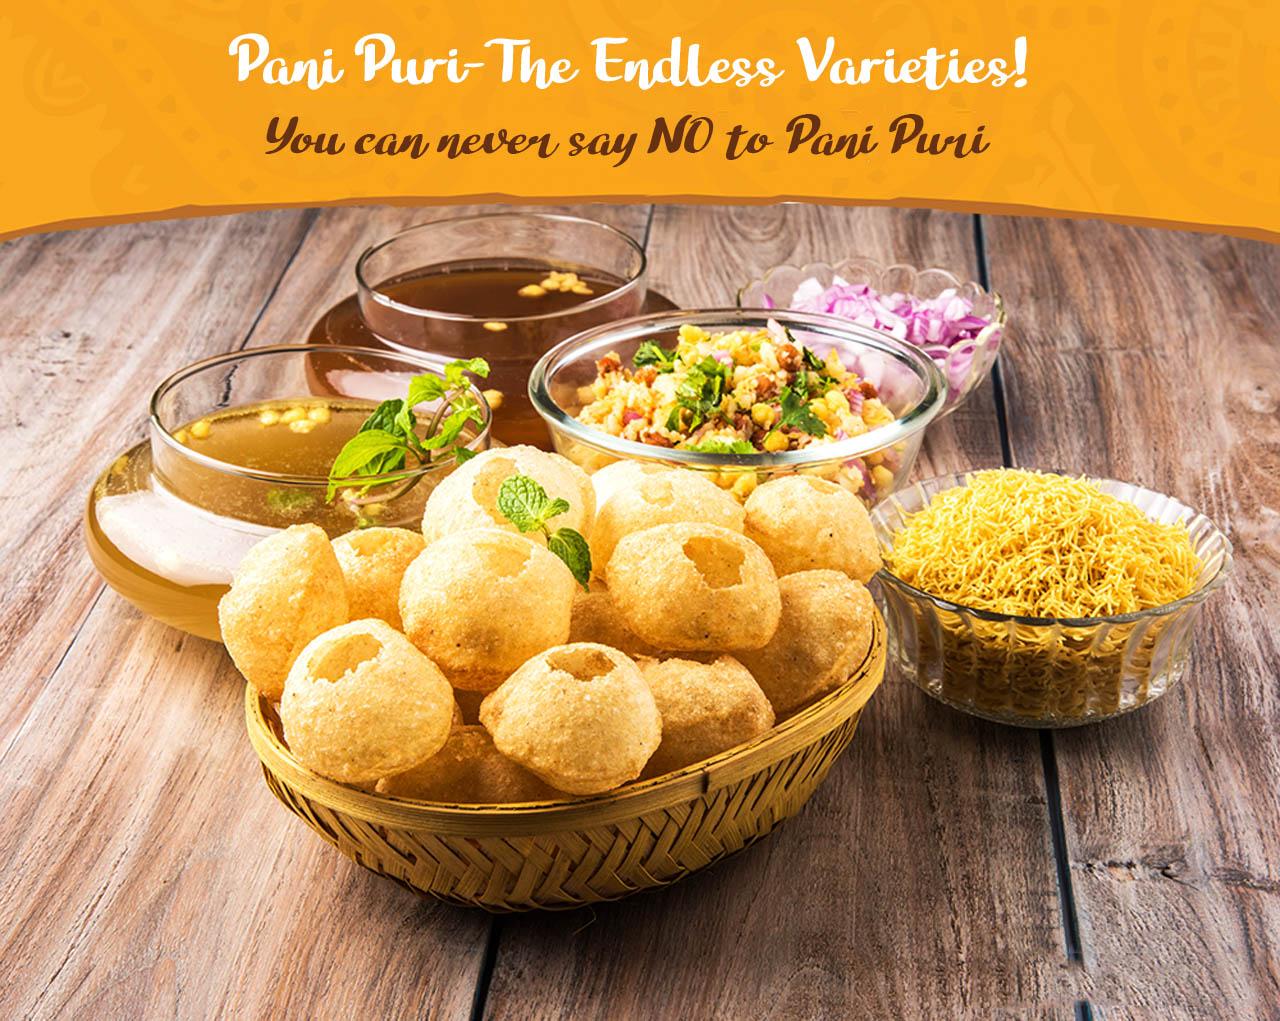 Pani Puri: The Endless Varieties